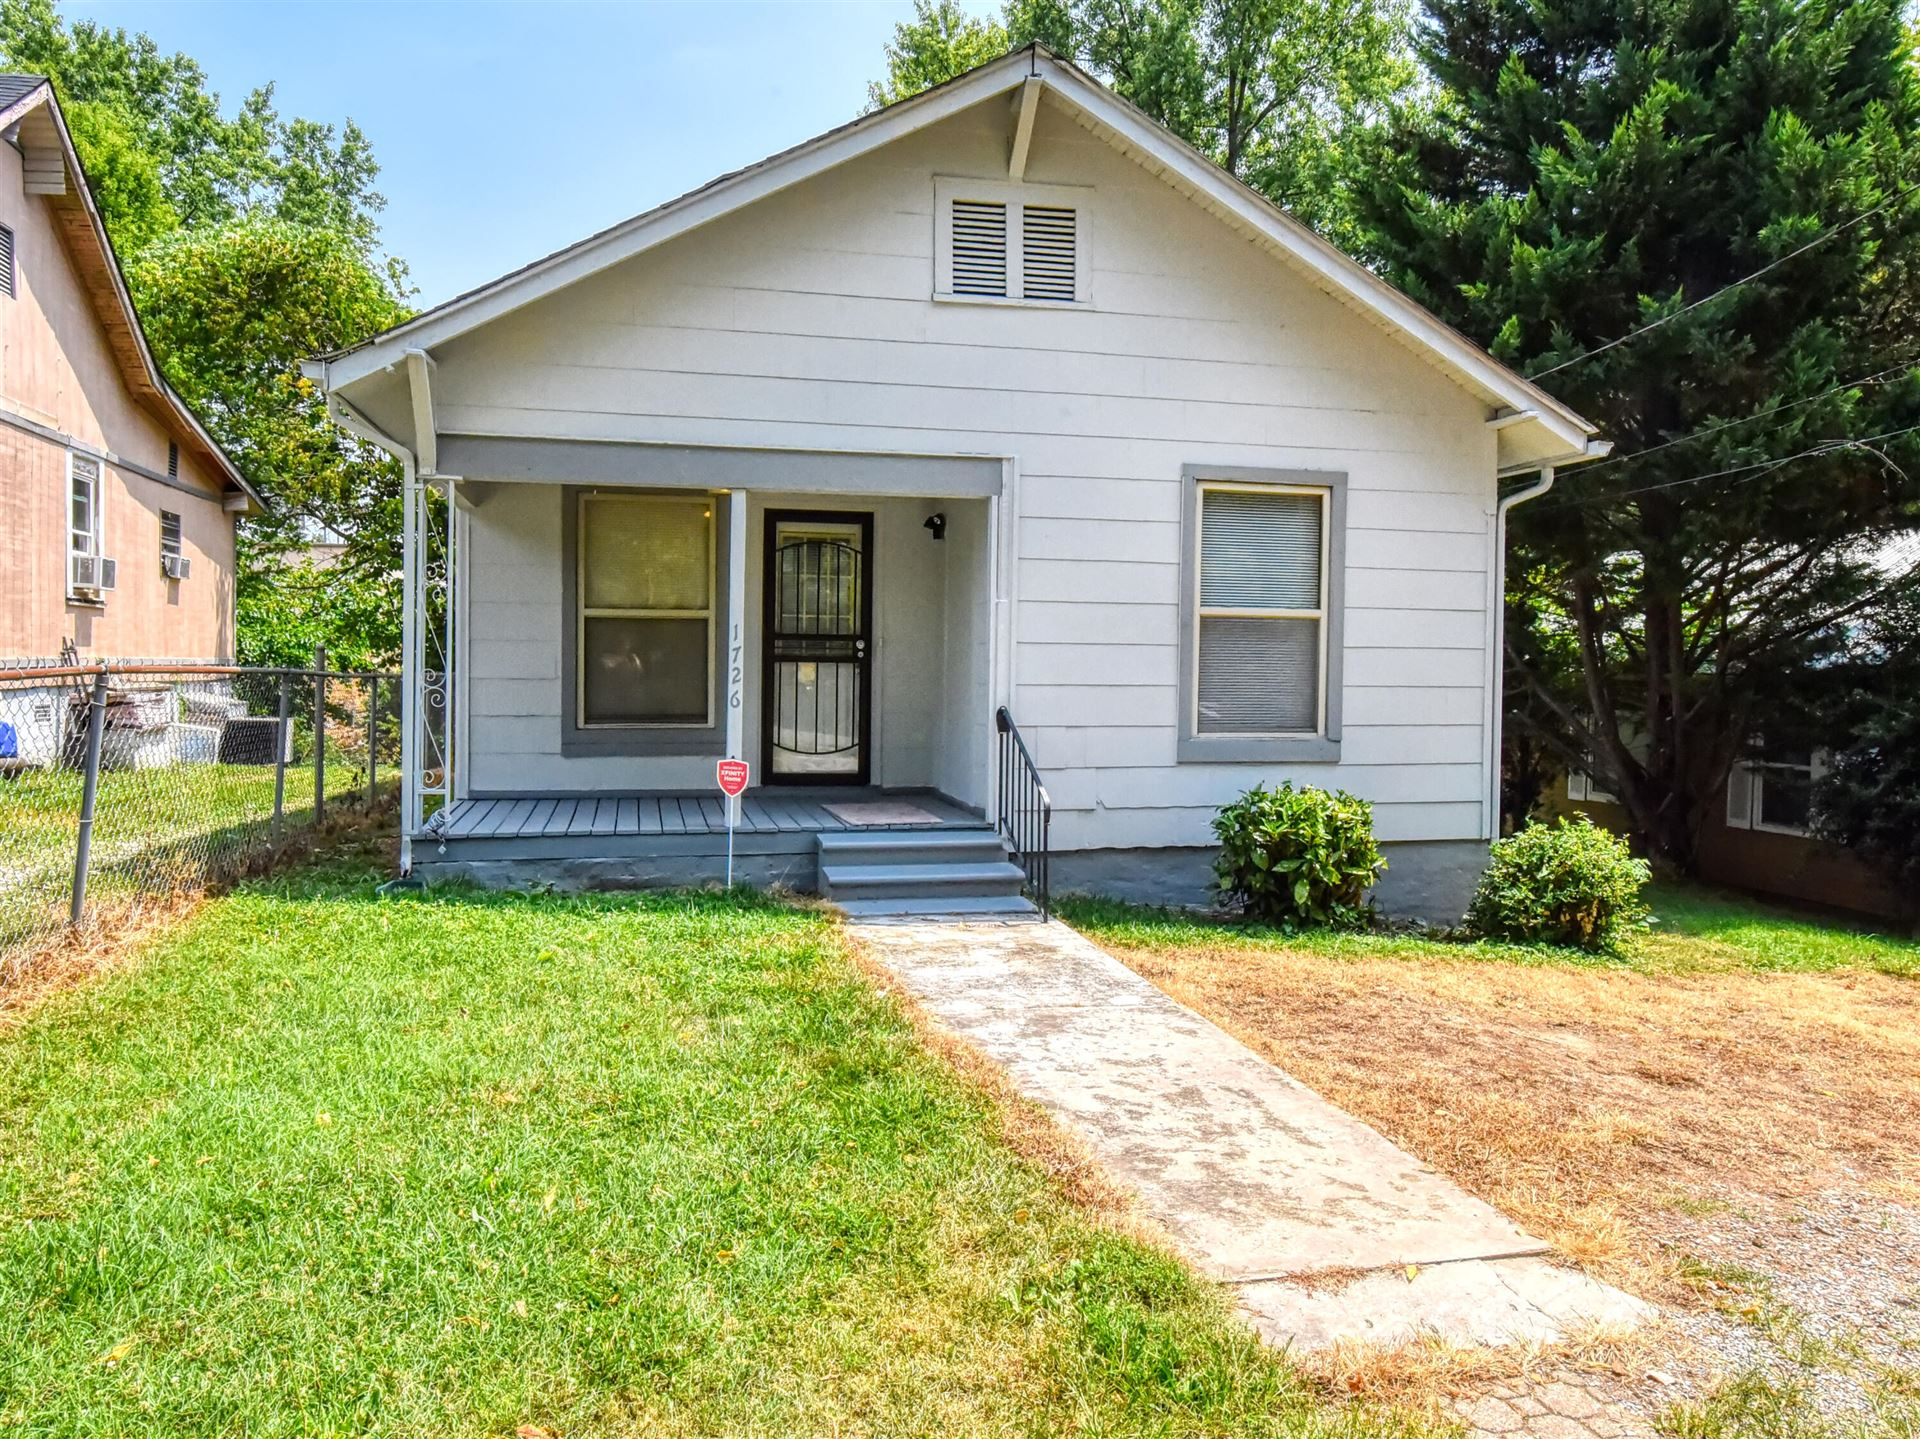 Photo of 1726 Wheeler St, Knoxville, TN 37917 (MLS # 1162361)